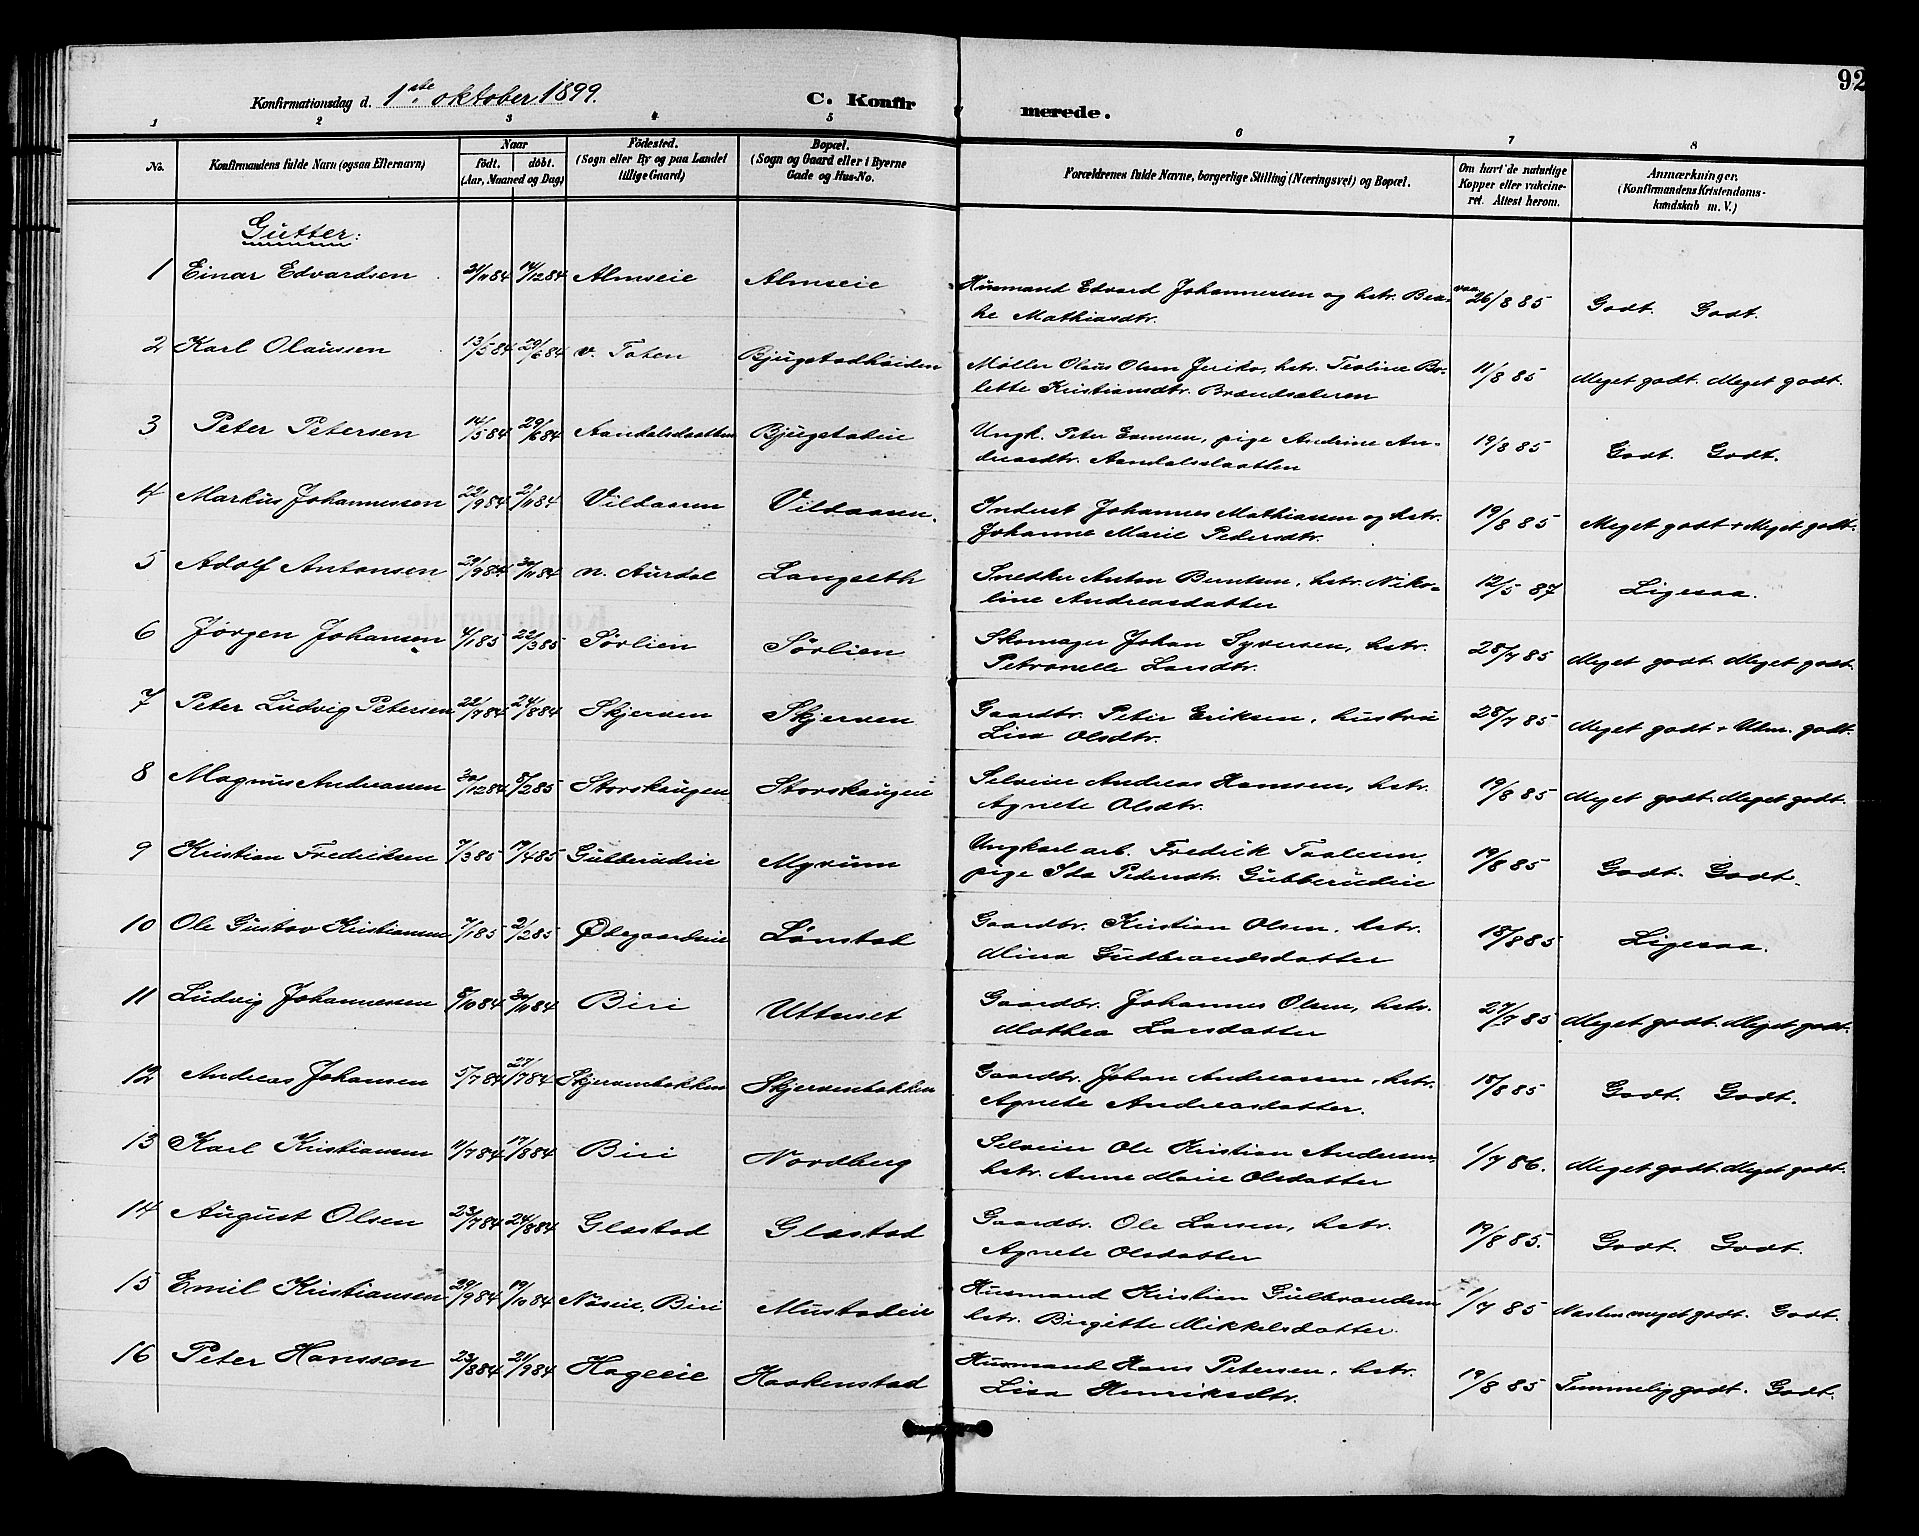 SAH, Vardal prestekontor, H/Ha/Hab/L0011: Klokkerbok nr. 11, 1899-1913, s. 92